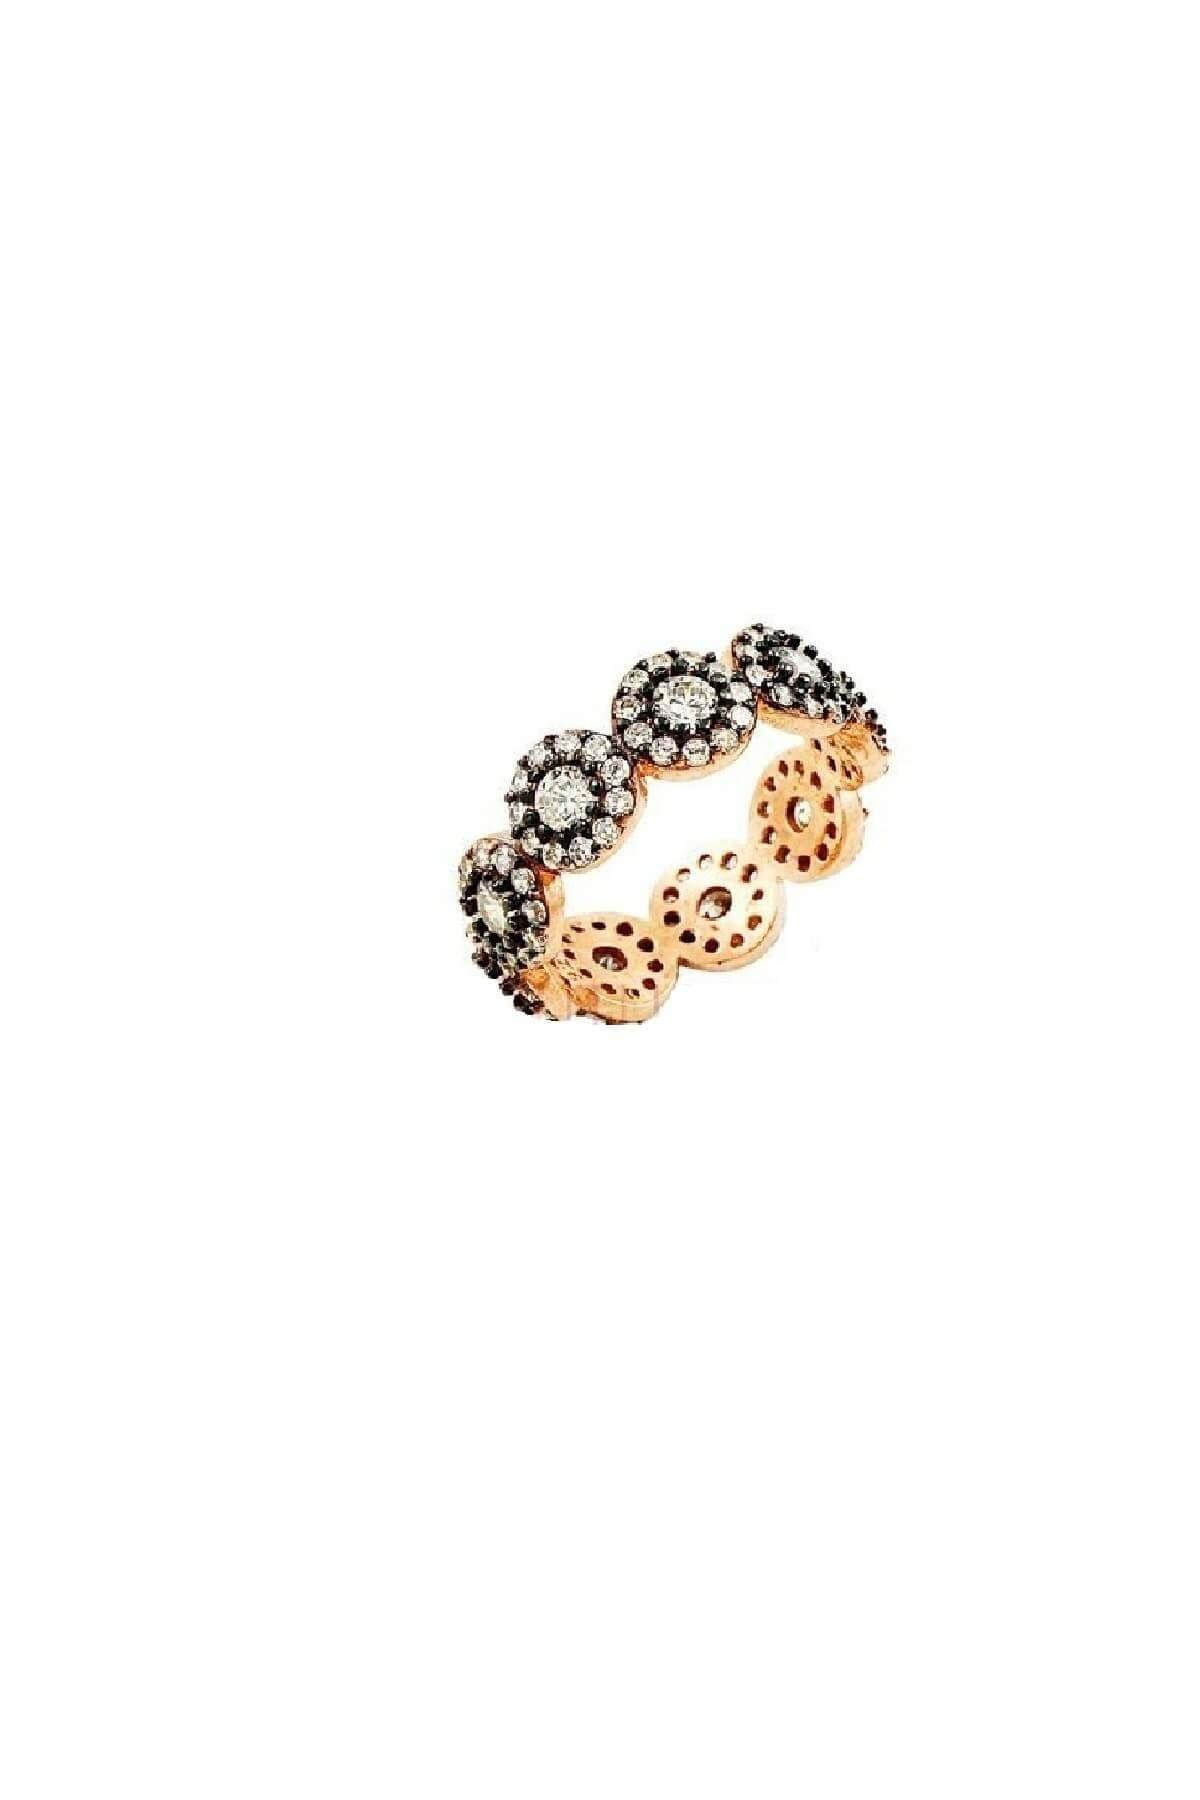 سفارش انگشتر ارزان زنانه برند Söğütlü Silver رنگ صورتی ty3233248